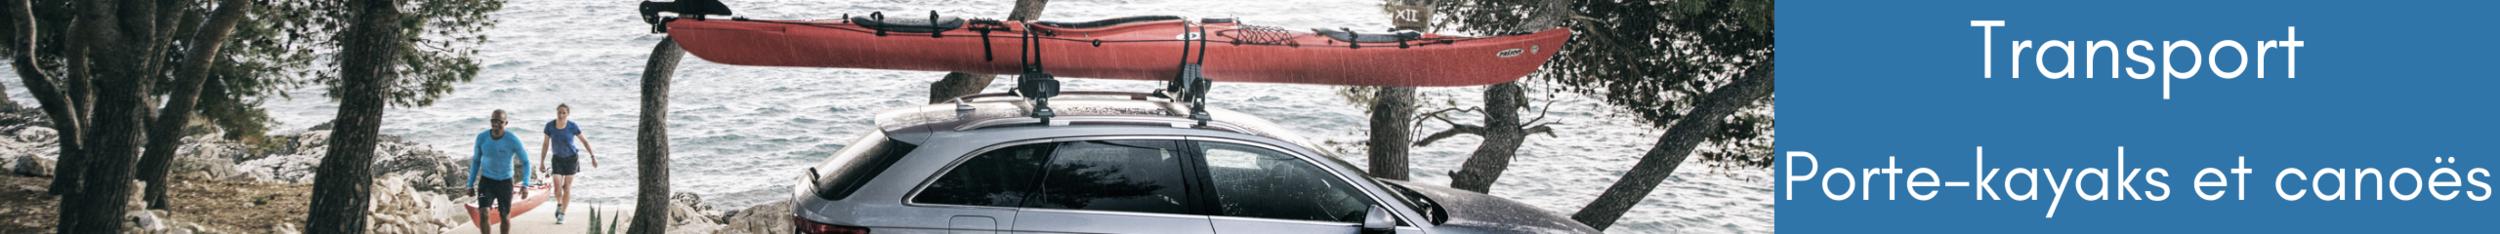 PADL-CATEGORIES-BANNIERES-porte-kayak